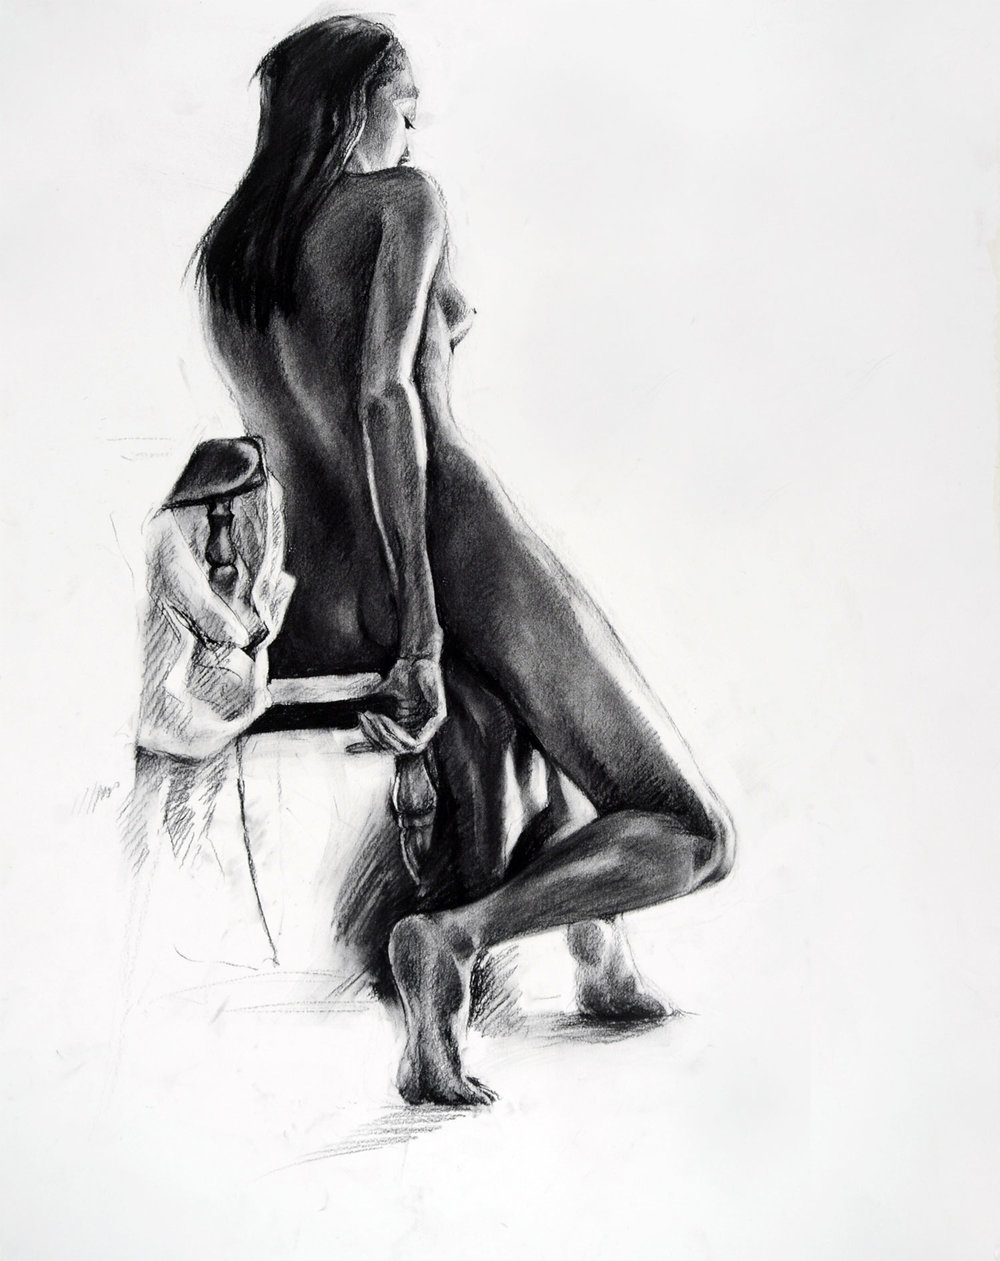 course-figure-drawing-works-01-v01-2018-08.jpg